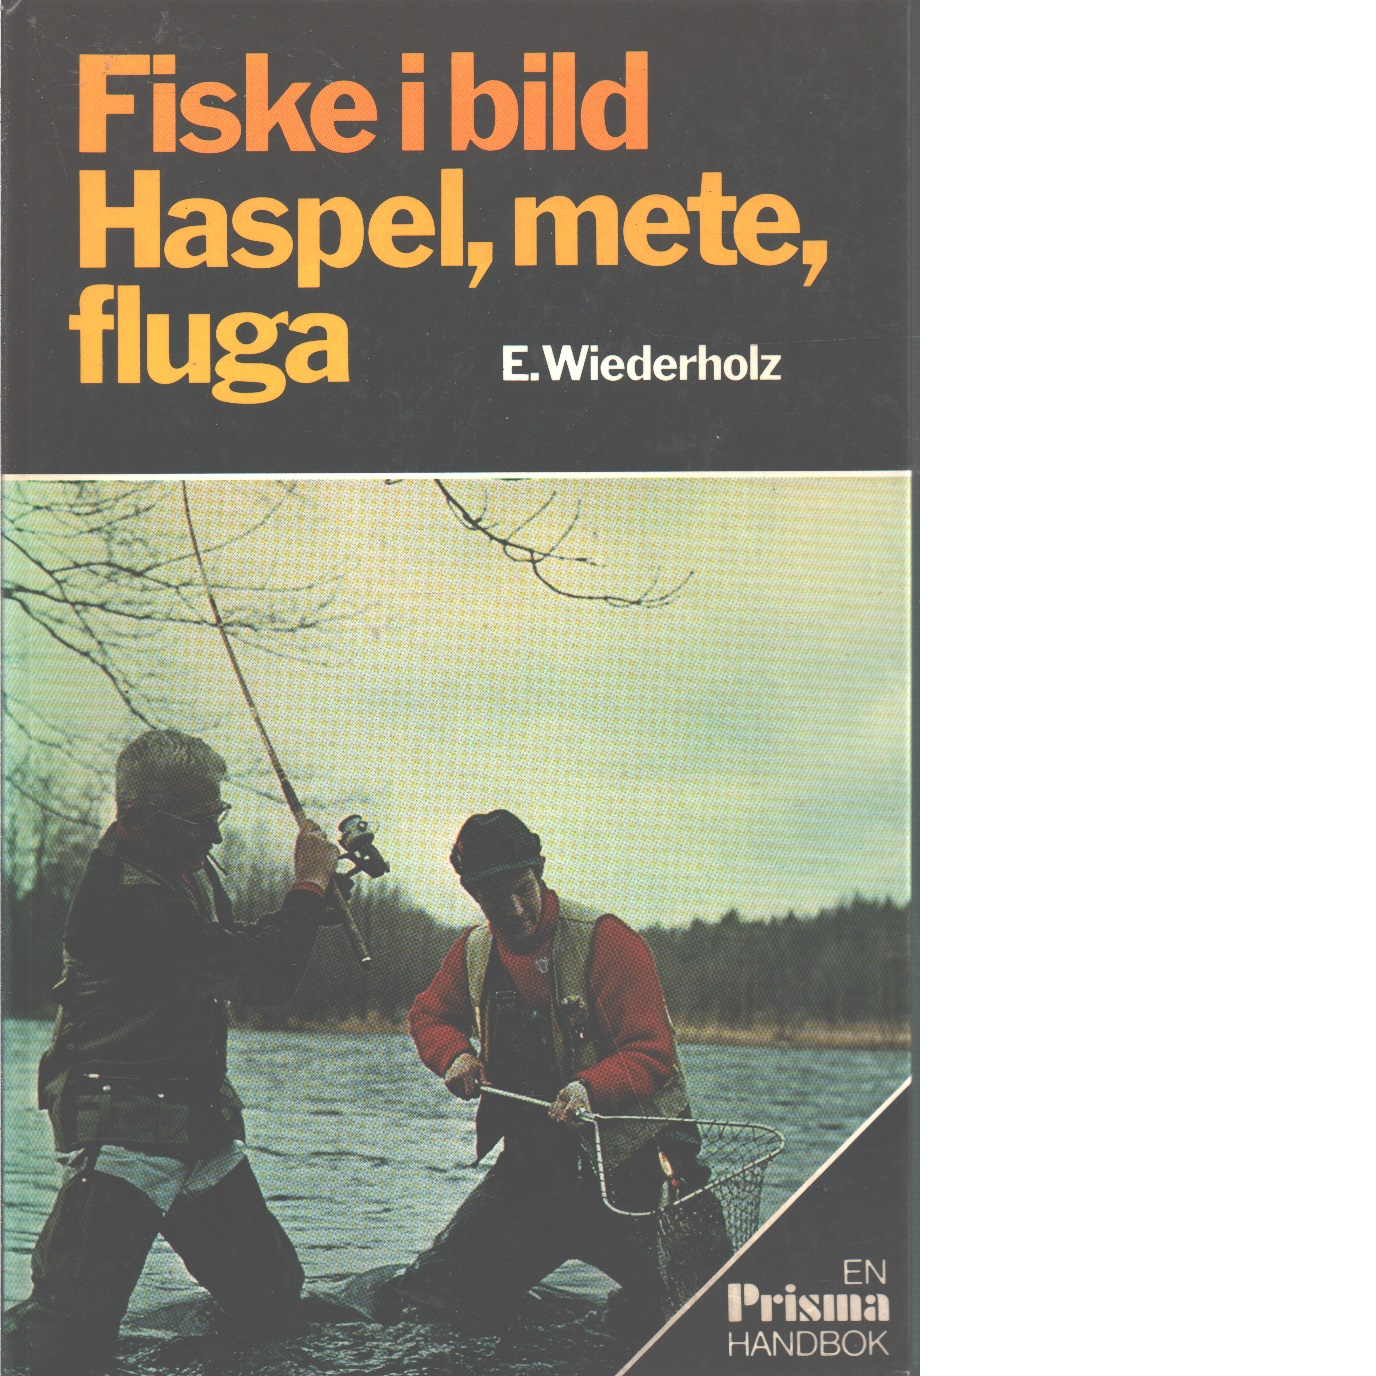 Fiske i bild : haspel, mete, fluga - Wiederholz, Ekkehard